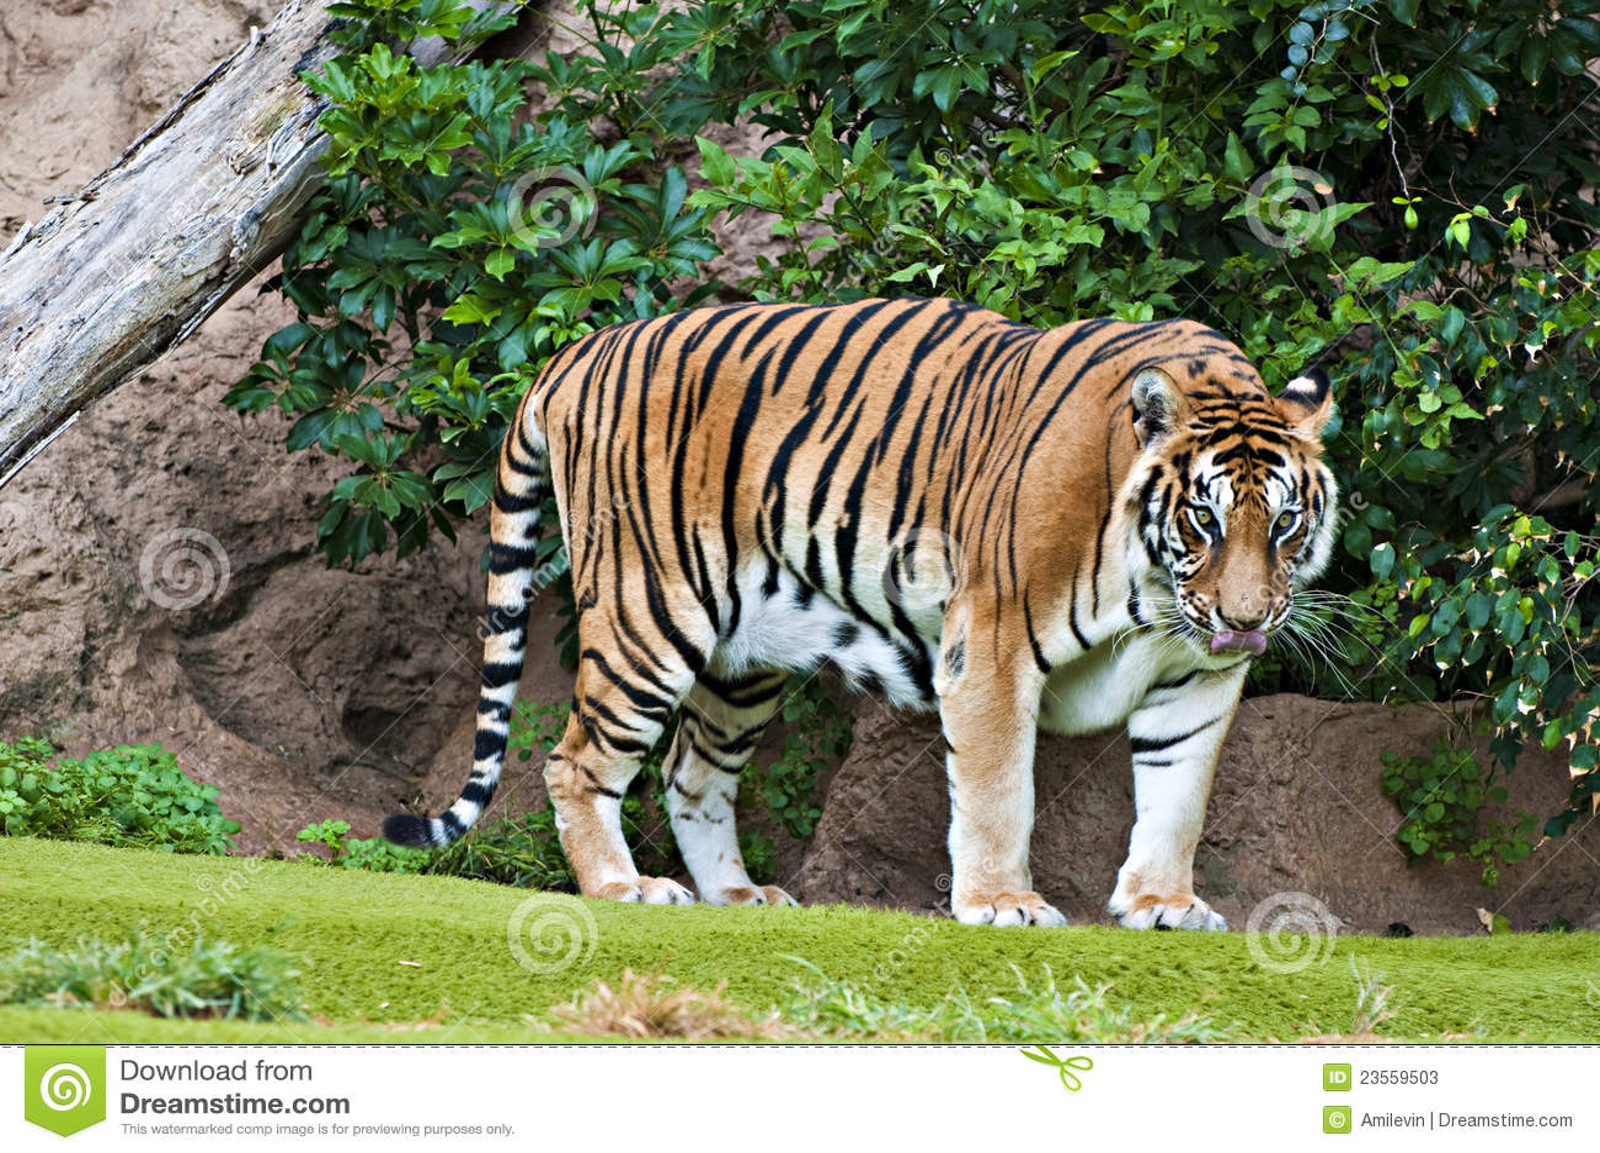 bengalí grande